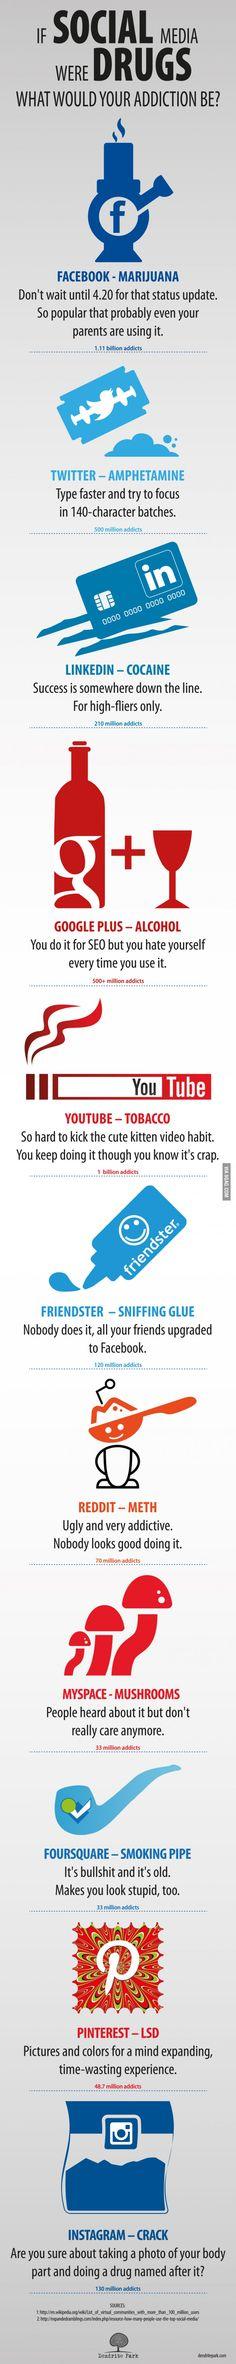 If Social Media Were Drugs